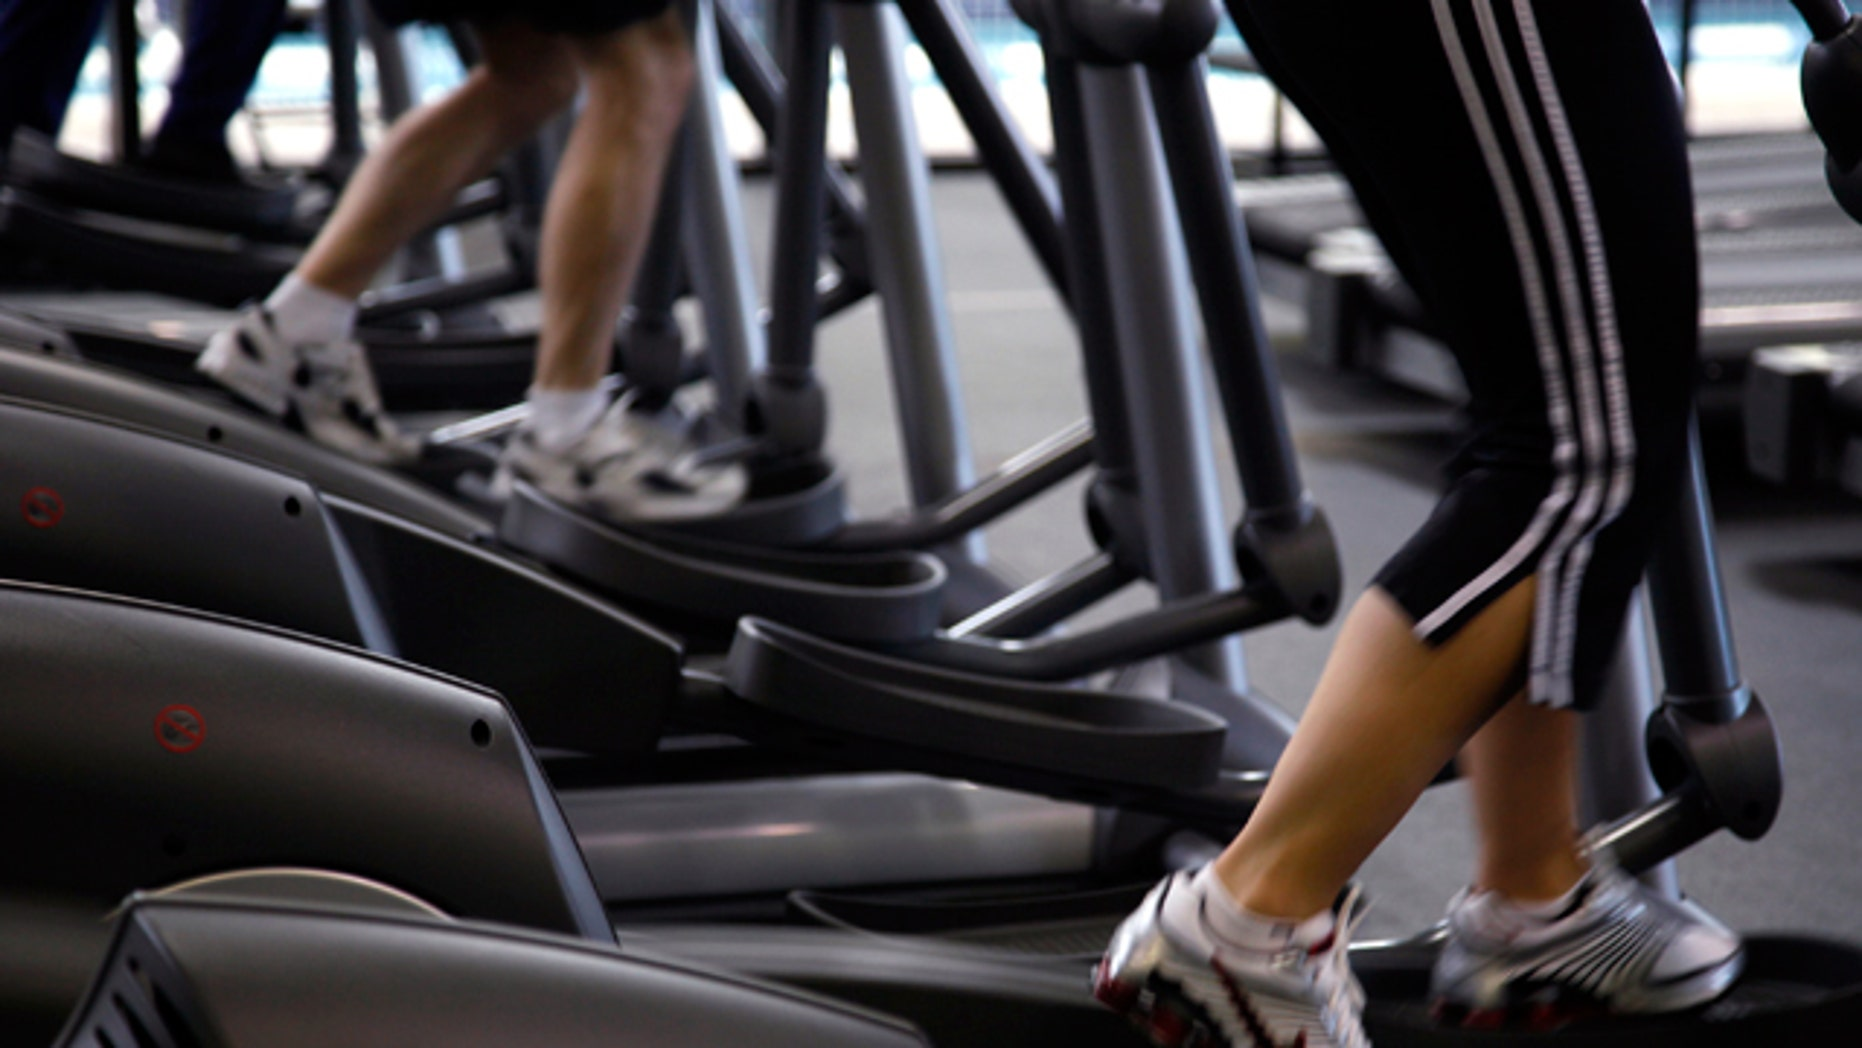 10 Fitness Myths Holding You Back